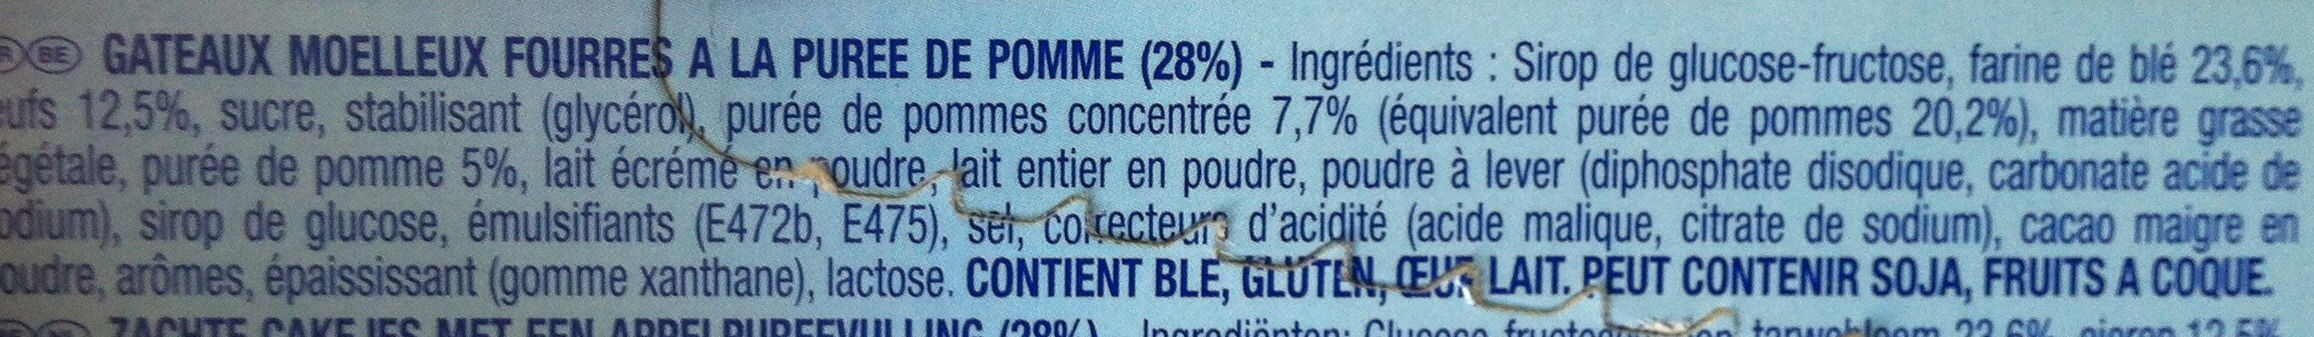 Lulu l'ourson Pomme - Ingredients - fr